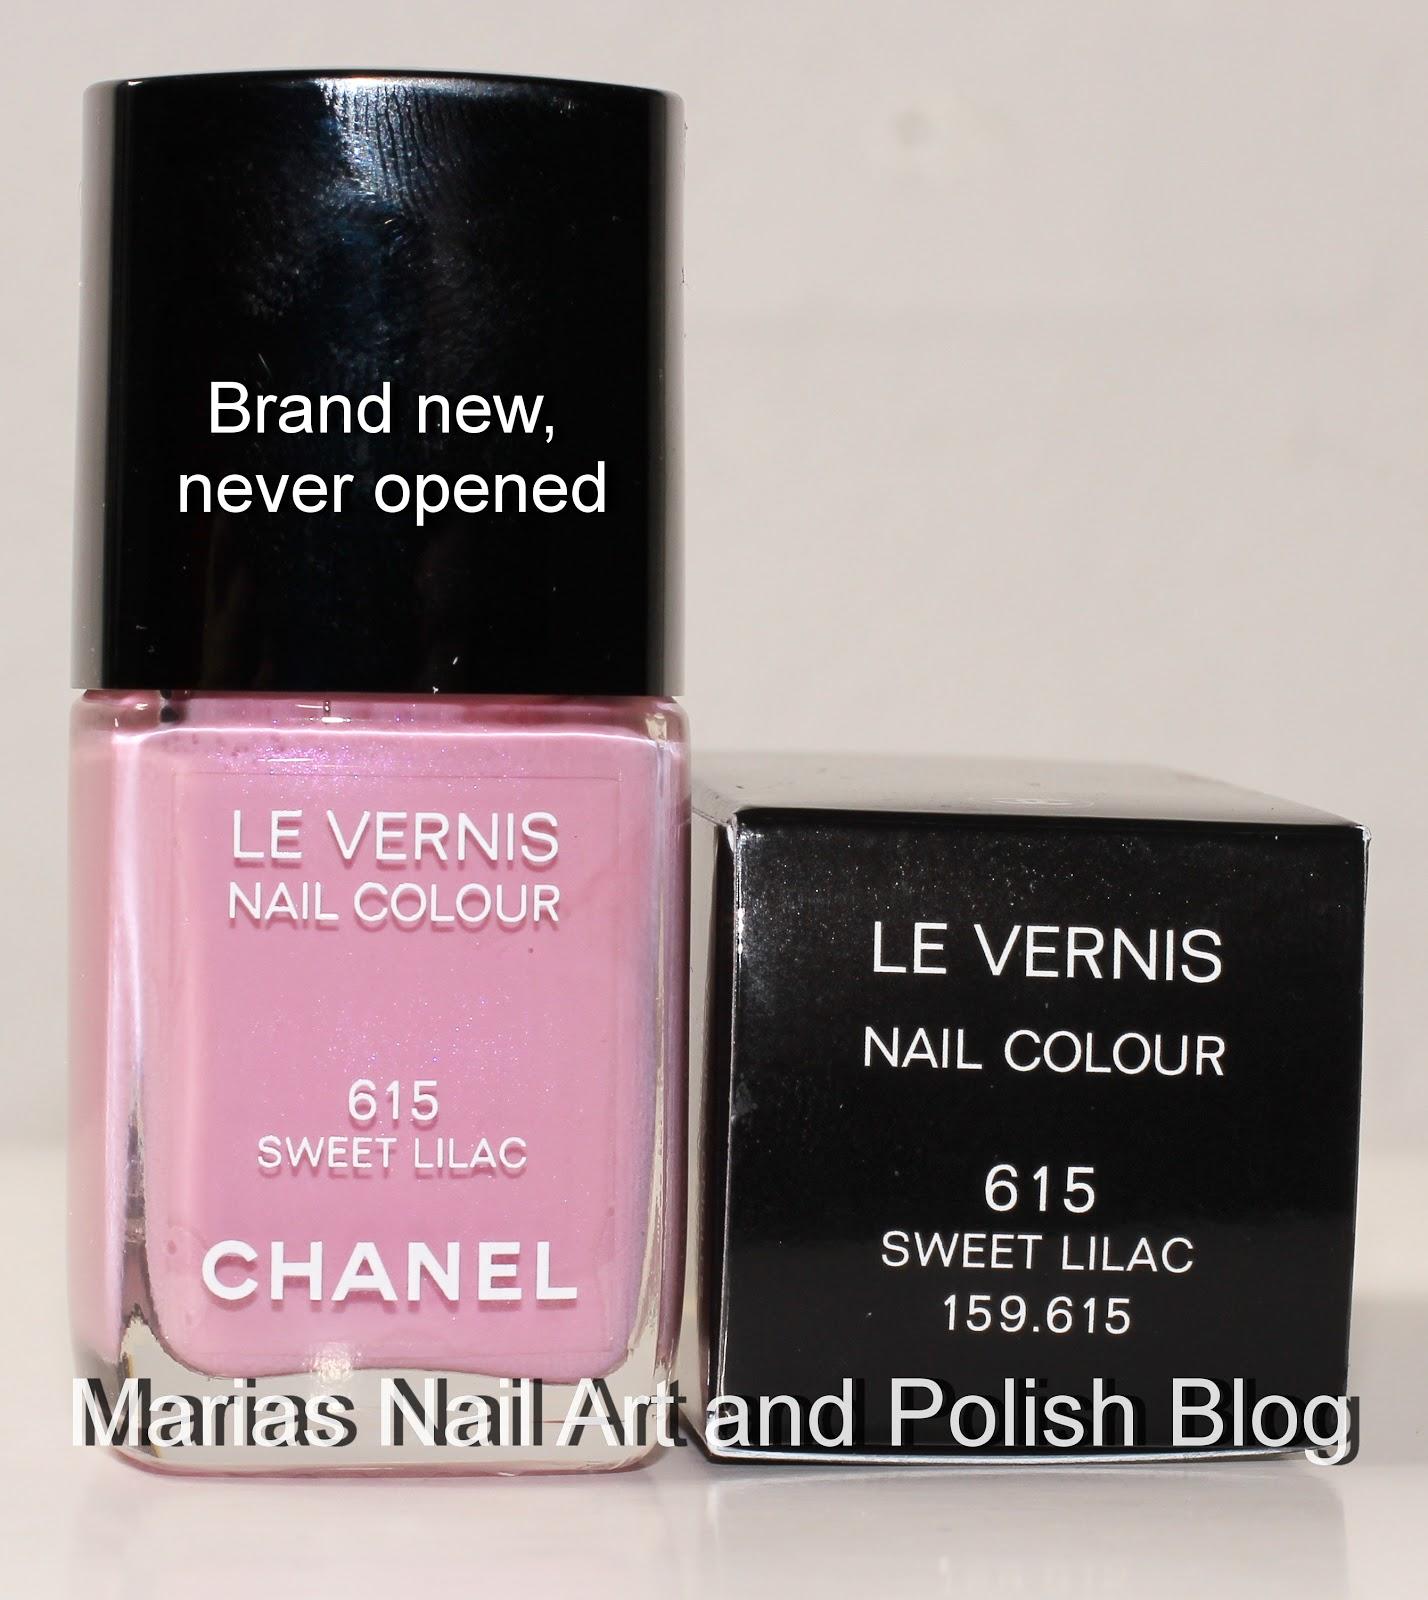 Chanel Holographic Nail Polish: Marias Nail Art And Polish Blog: Chanel Wish- And Swap List